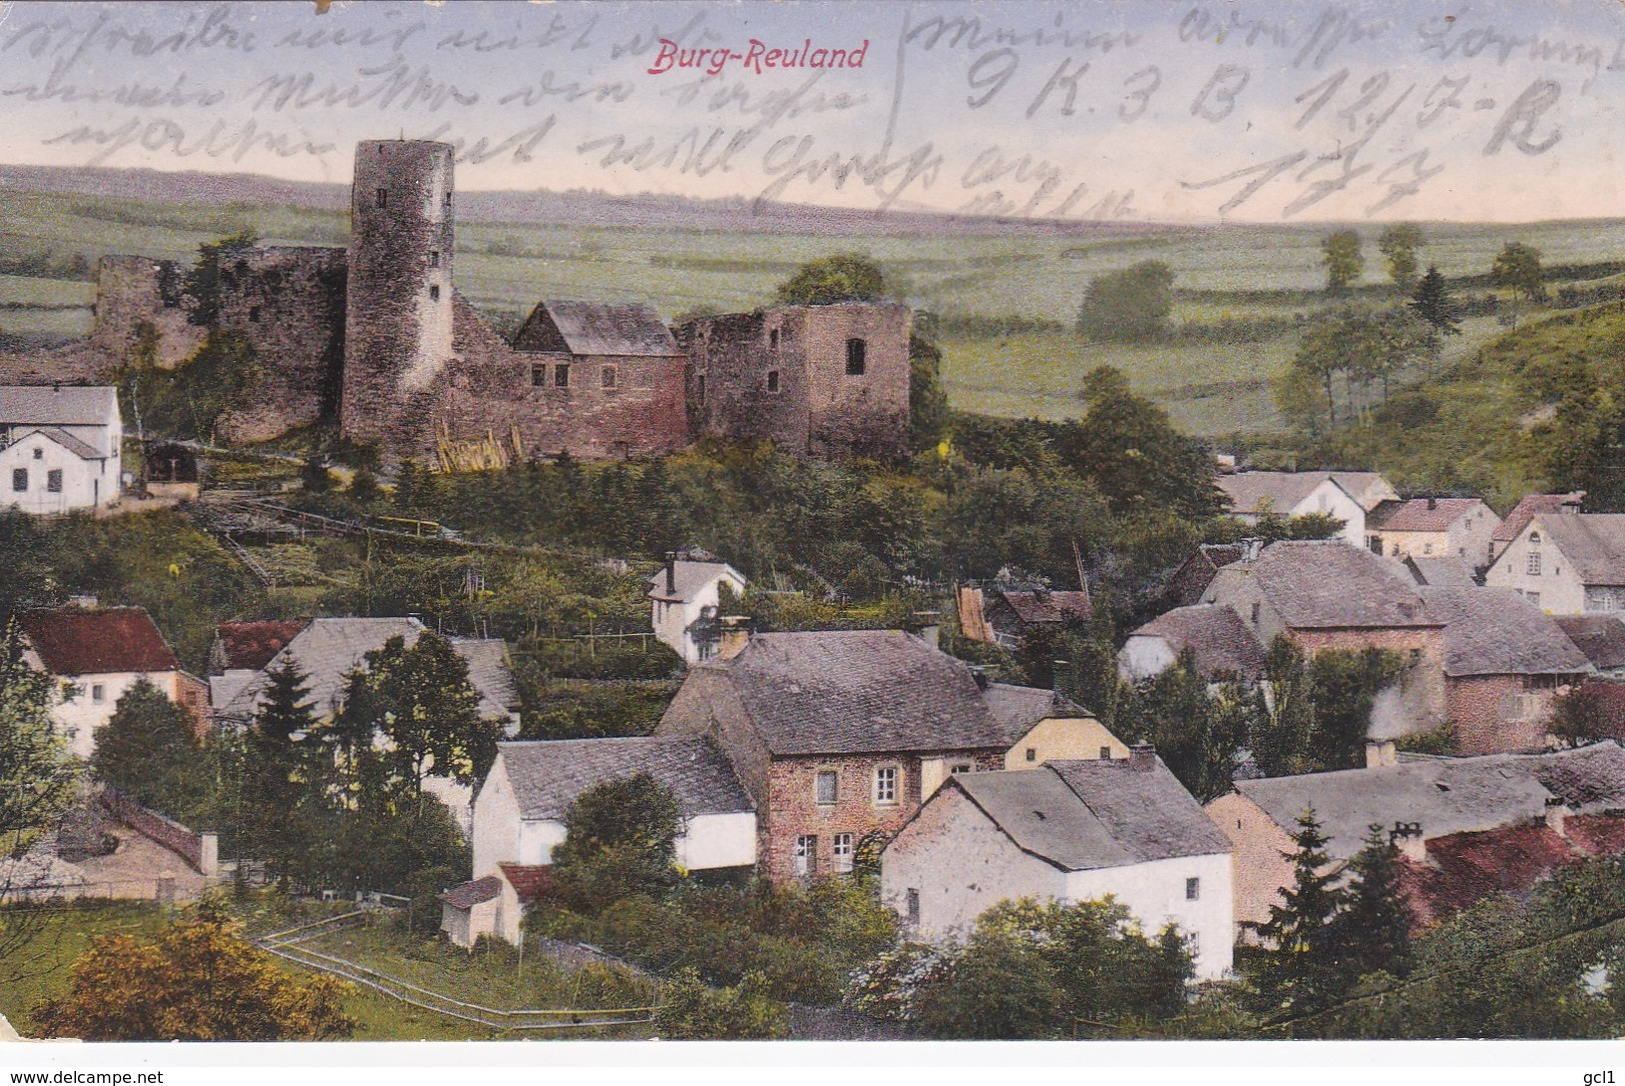 Burg - Reuland - Burg-Reuland